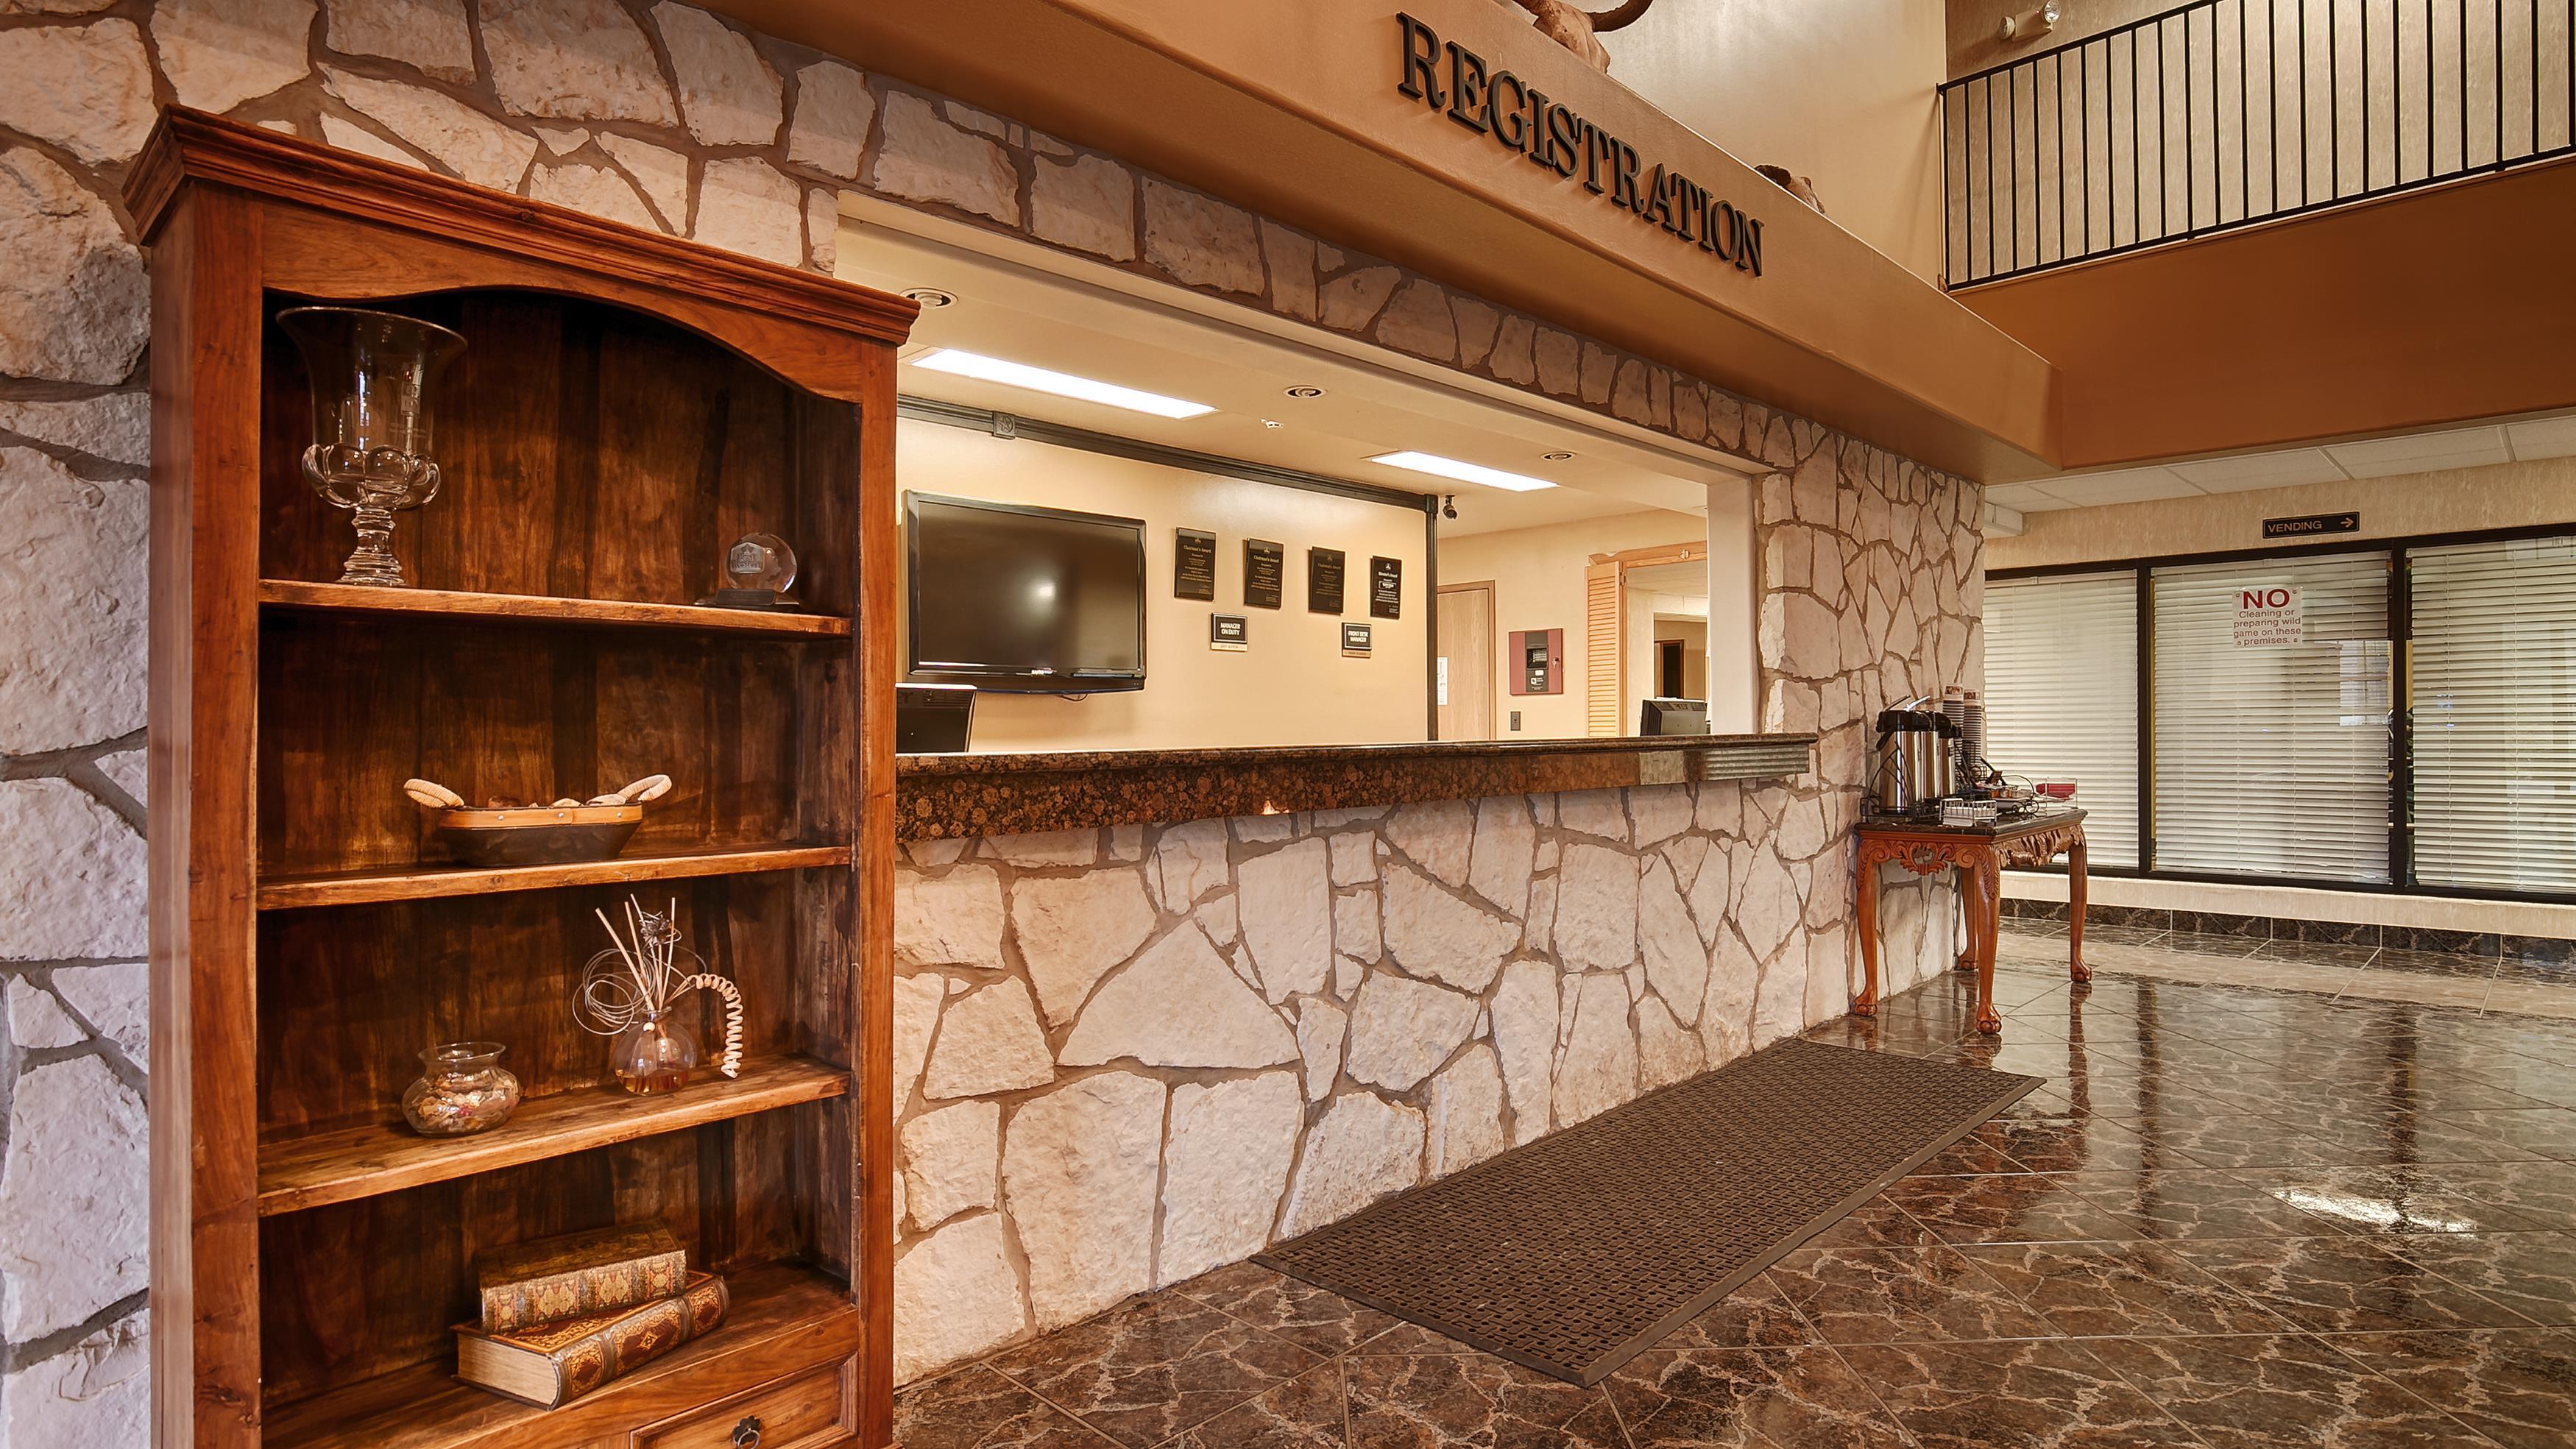 Best Western Texan Inn image 2